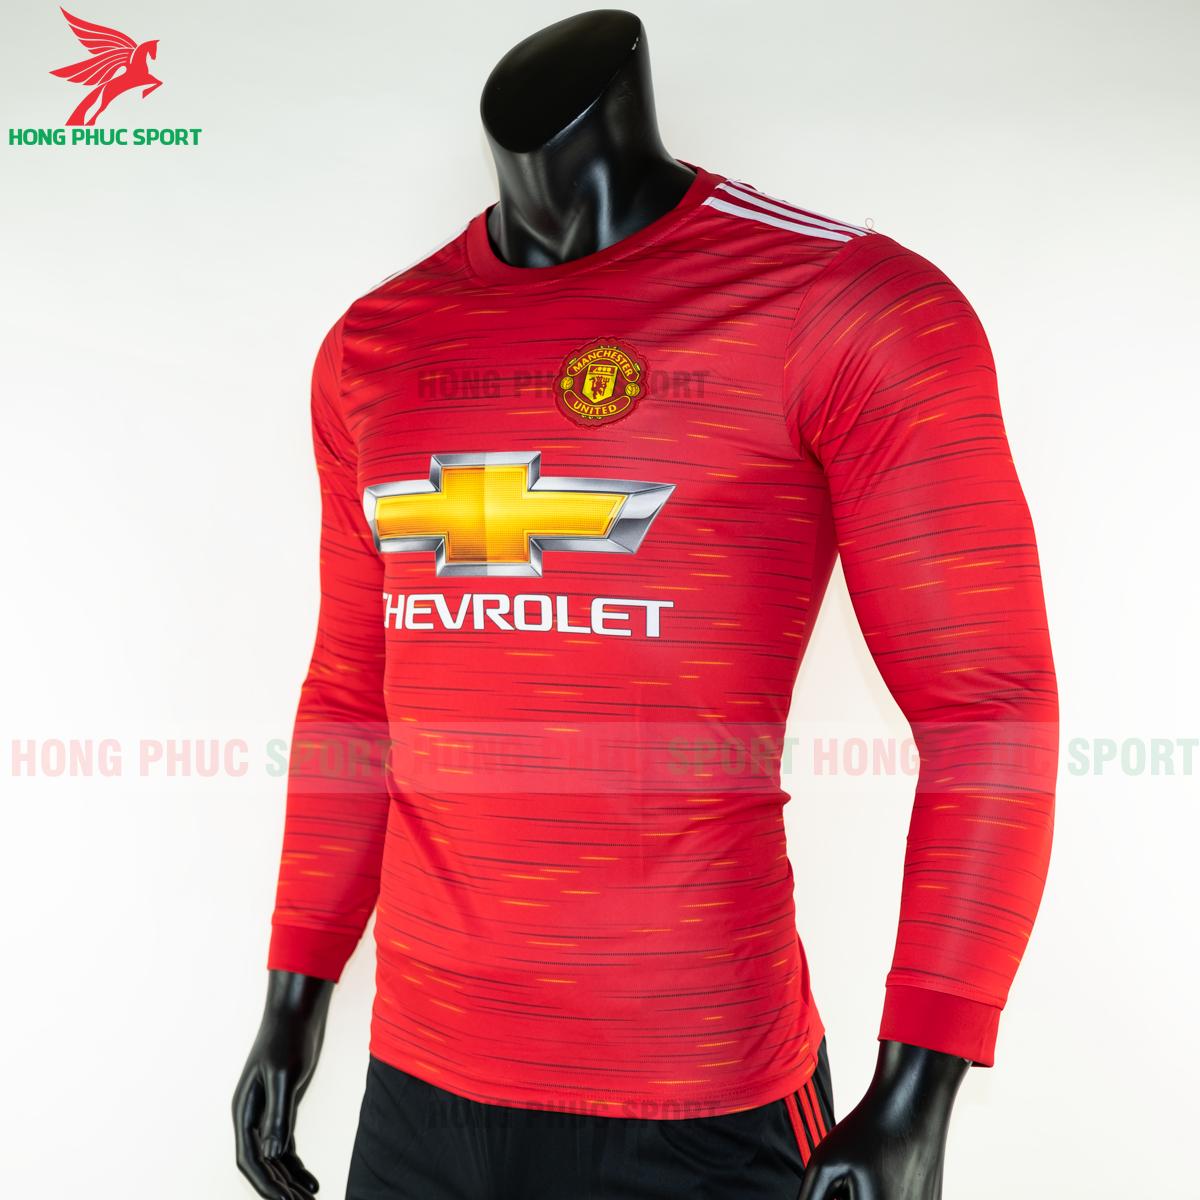 https://cdn.hongphucsport.com/unsafe/s4.shopbay.vn/files/285/ao-dai-tay-manchester-united-2020-san-nha-3-5f8fdd3864264.png